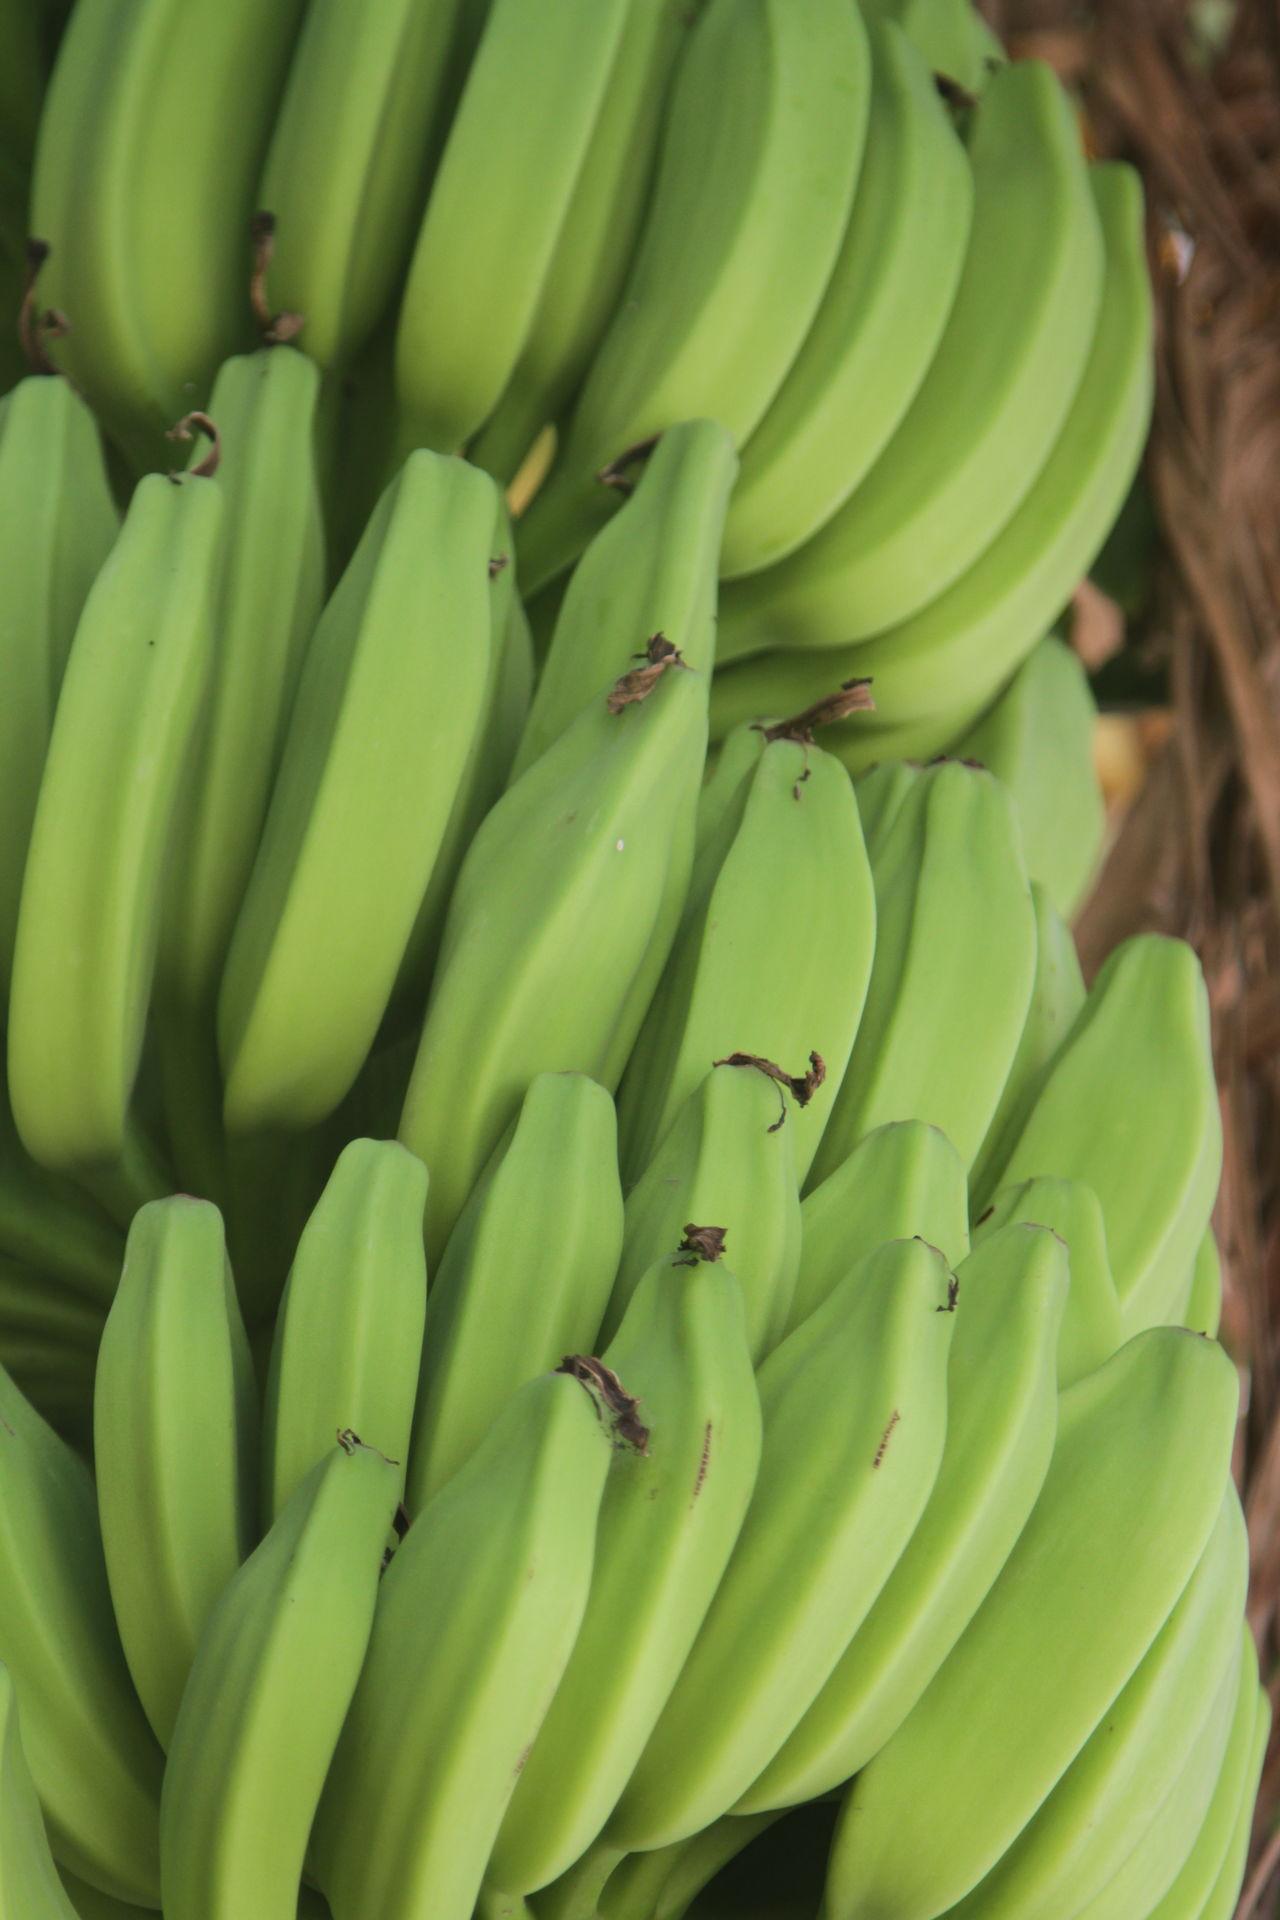 Banana Banana Tree Bananas A Dozend Food Food And Drink Freshness Fruit Green Bananas Green Color Healthy Eating No People Not Ripe Outdoors